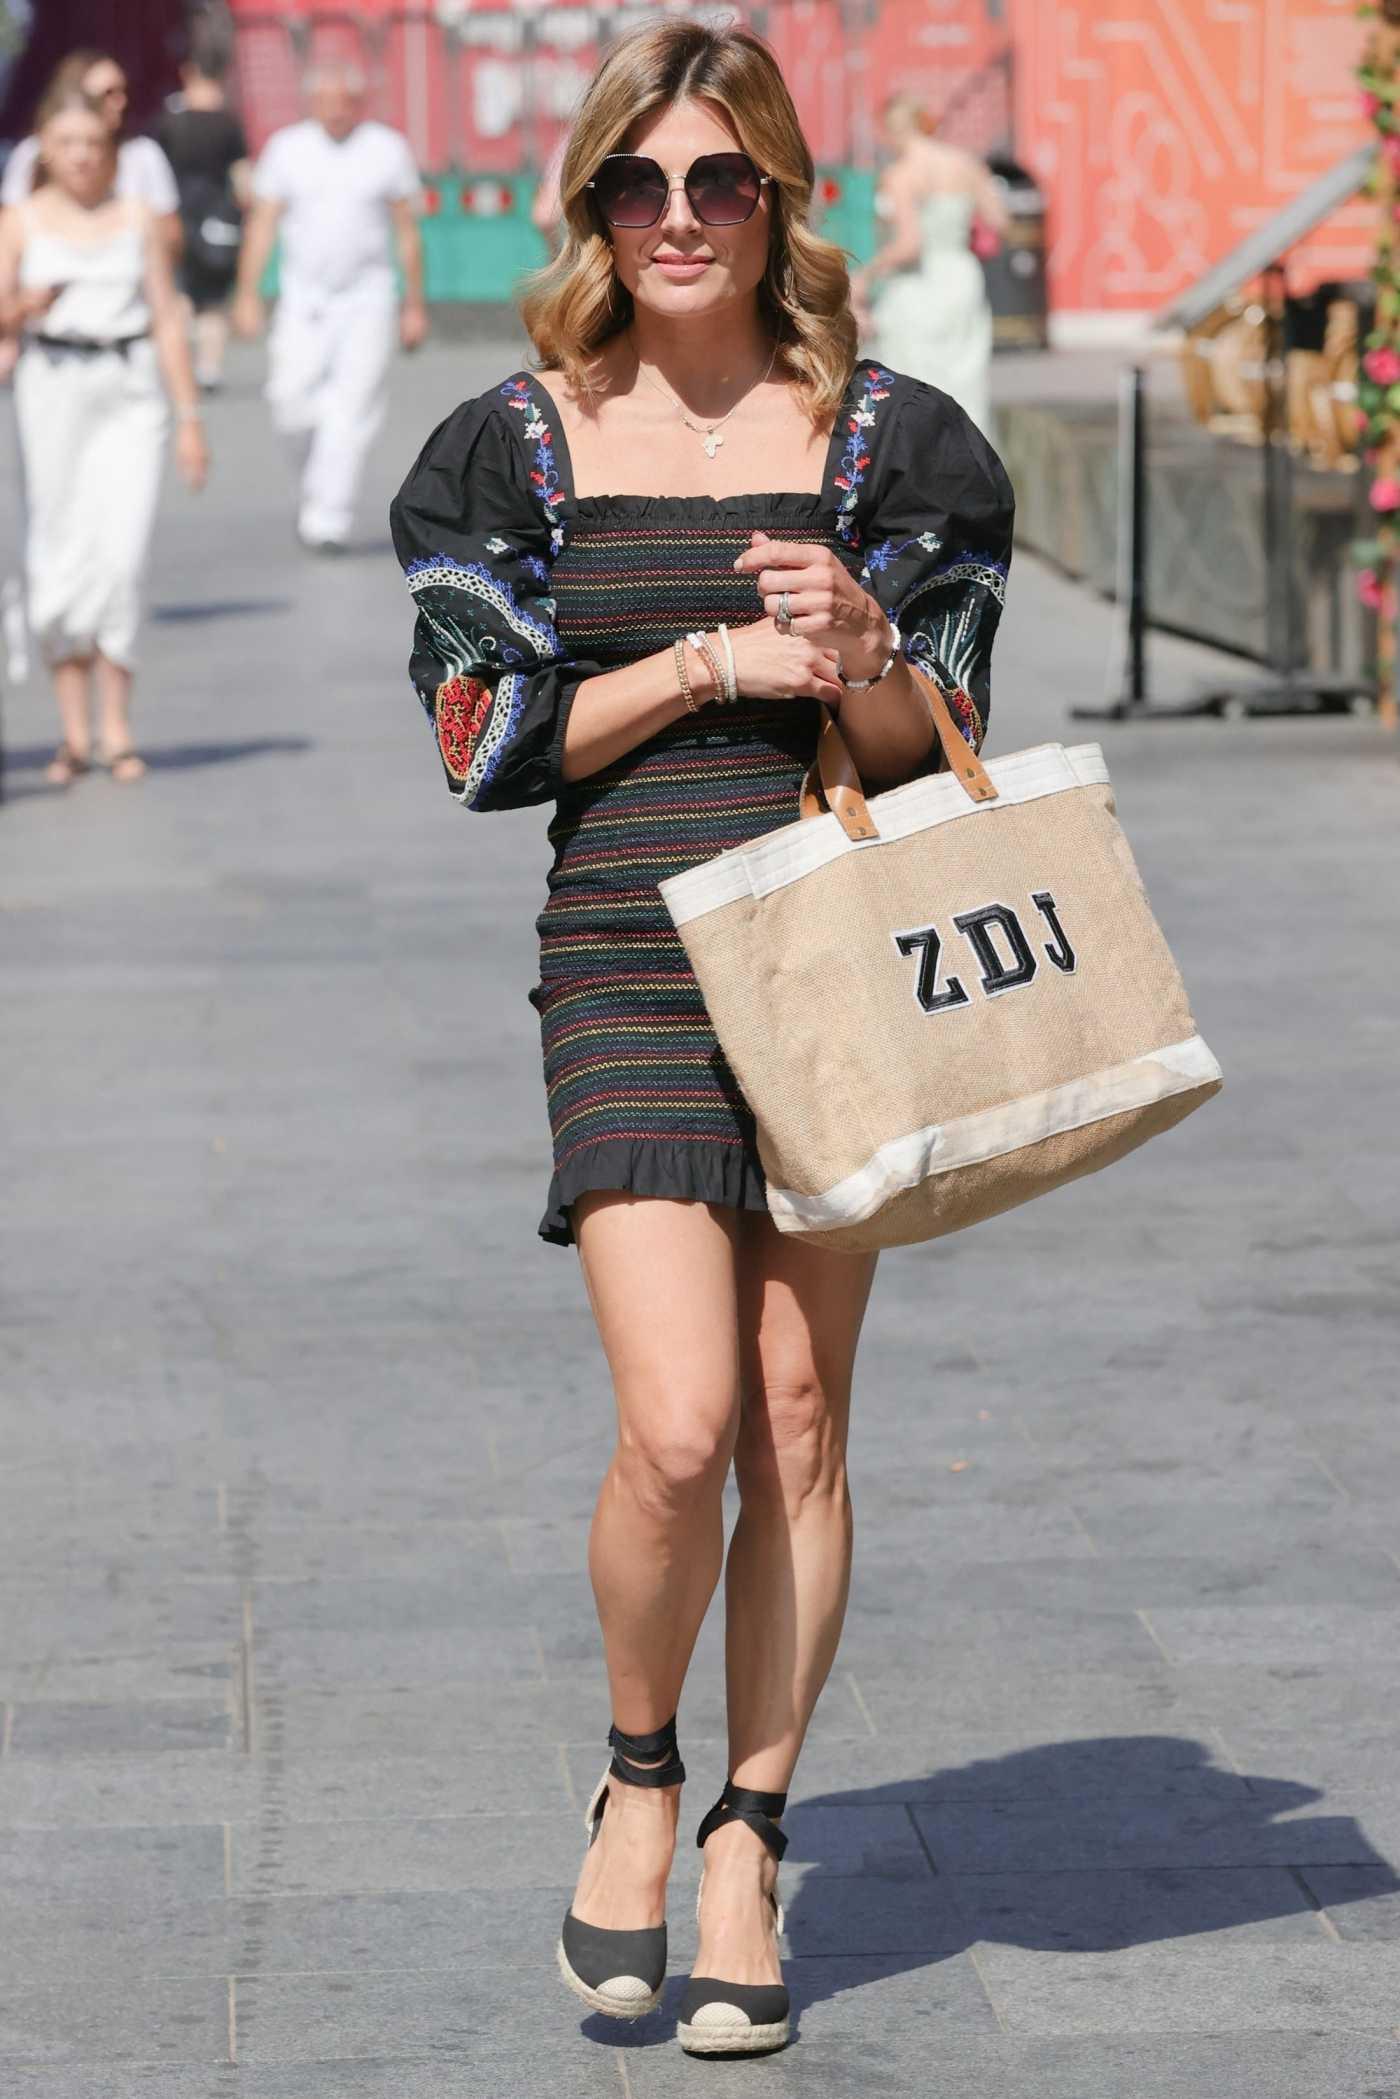 Zoe Hardman in a Black Striped Mini Dress Arrives at the Heart Radio in London 07/19/2021